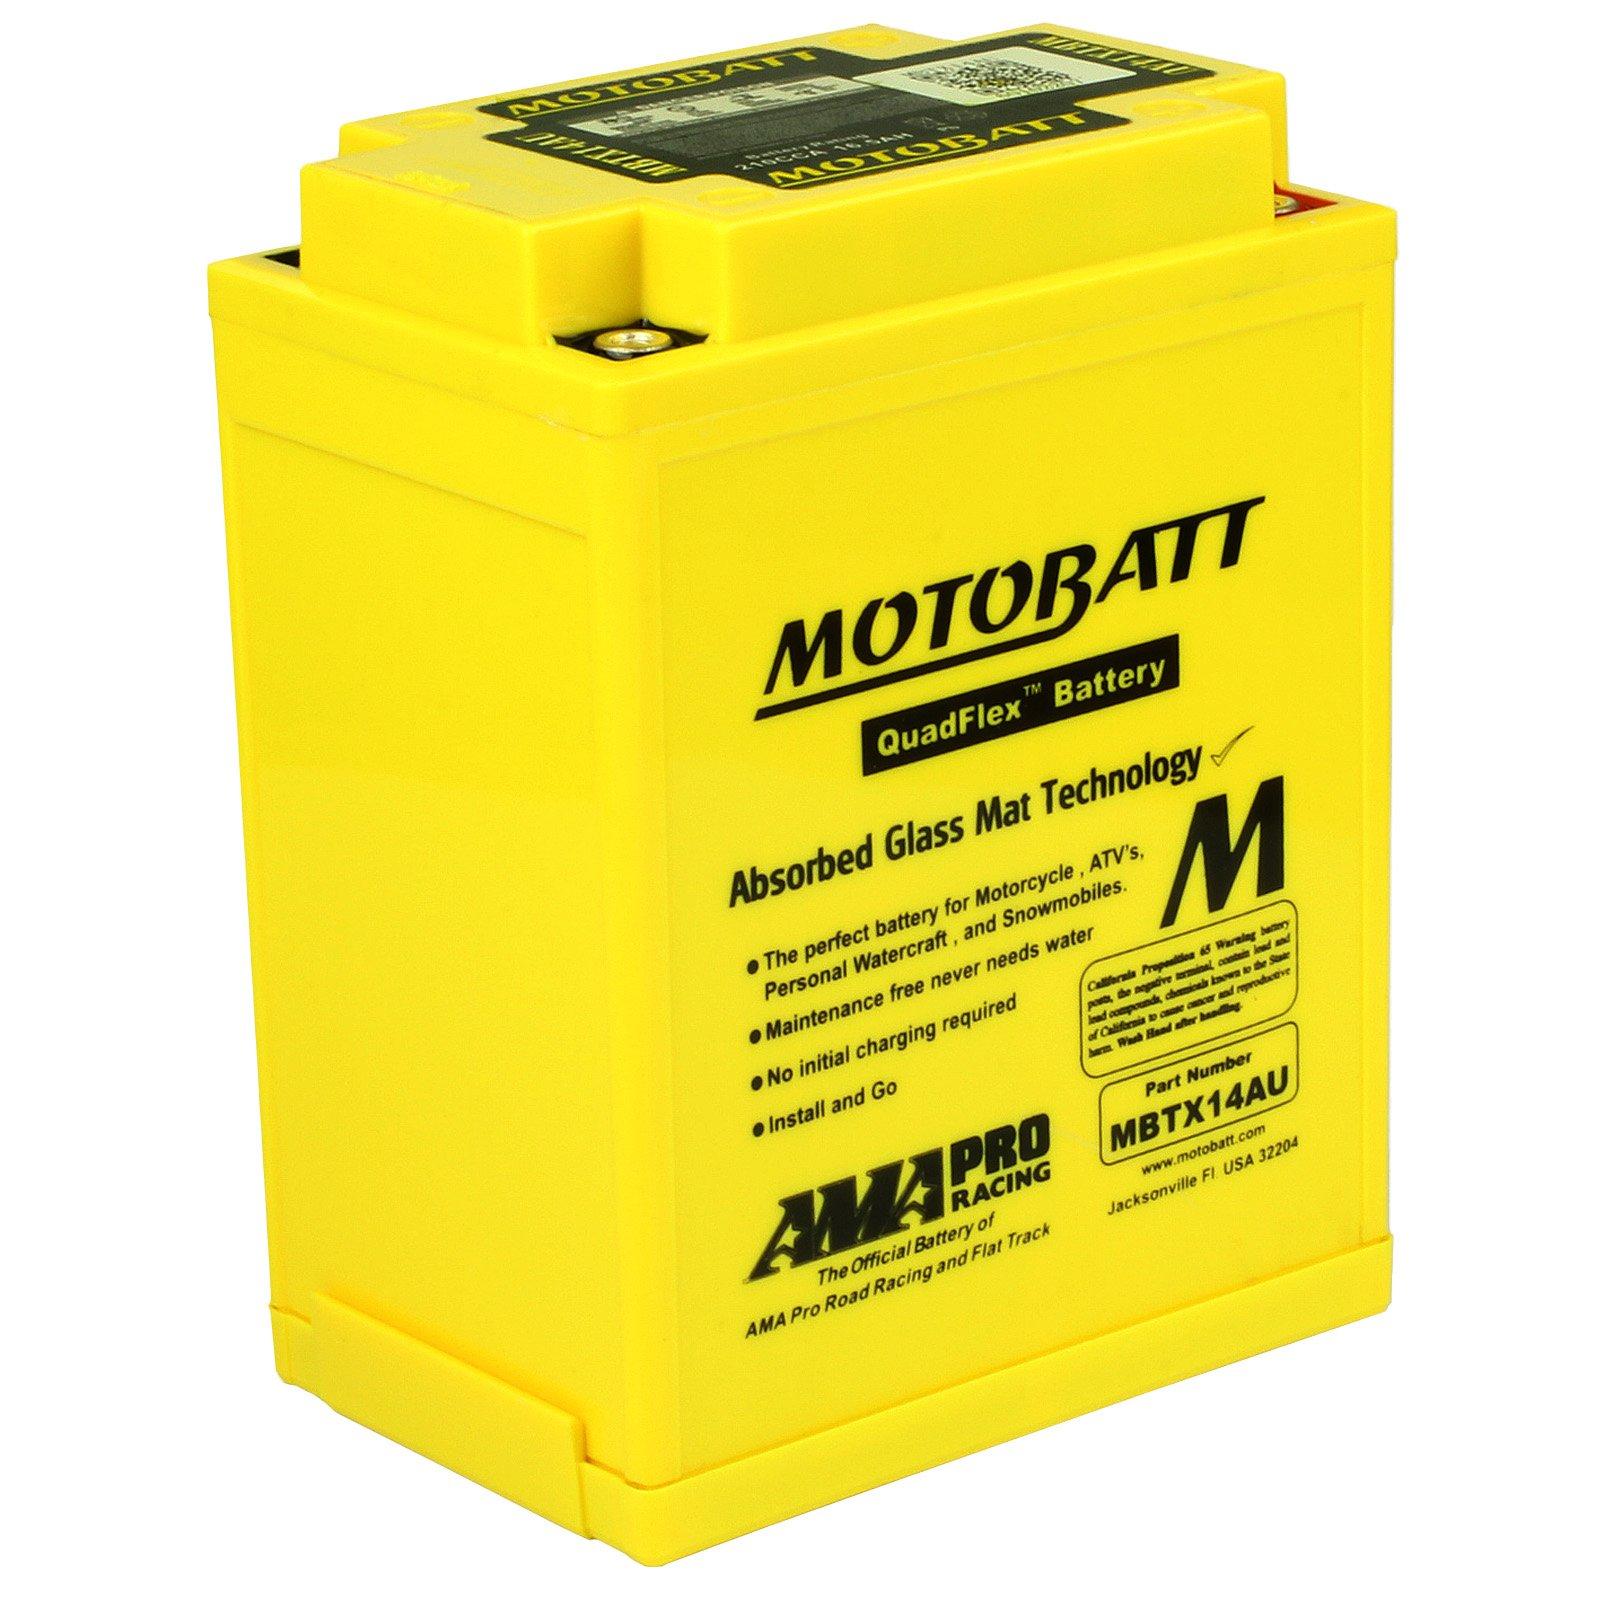 Motobatt MBTX14AU 12V 16 5Ah AGM Battery